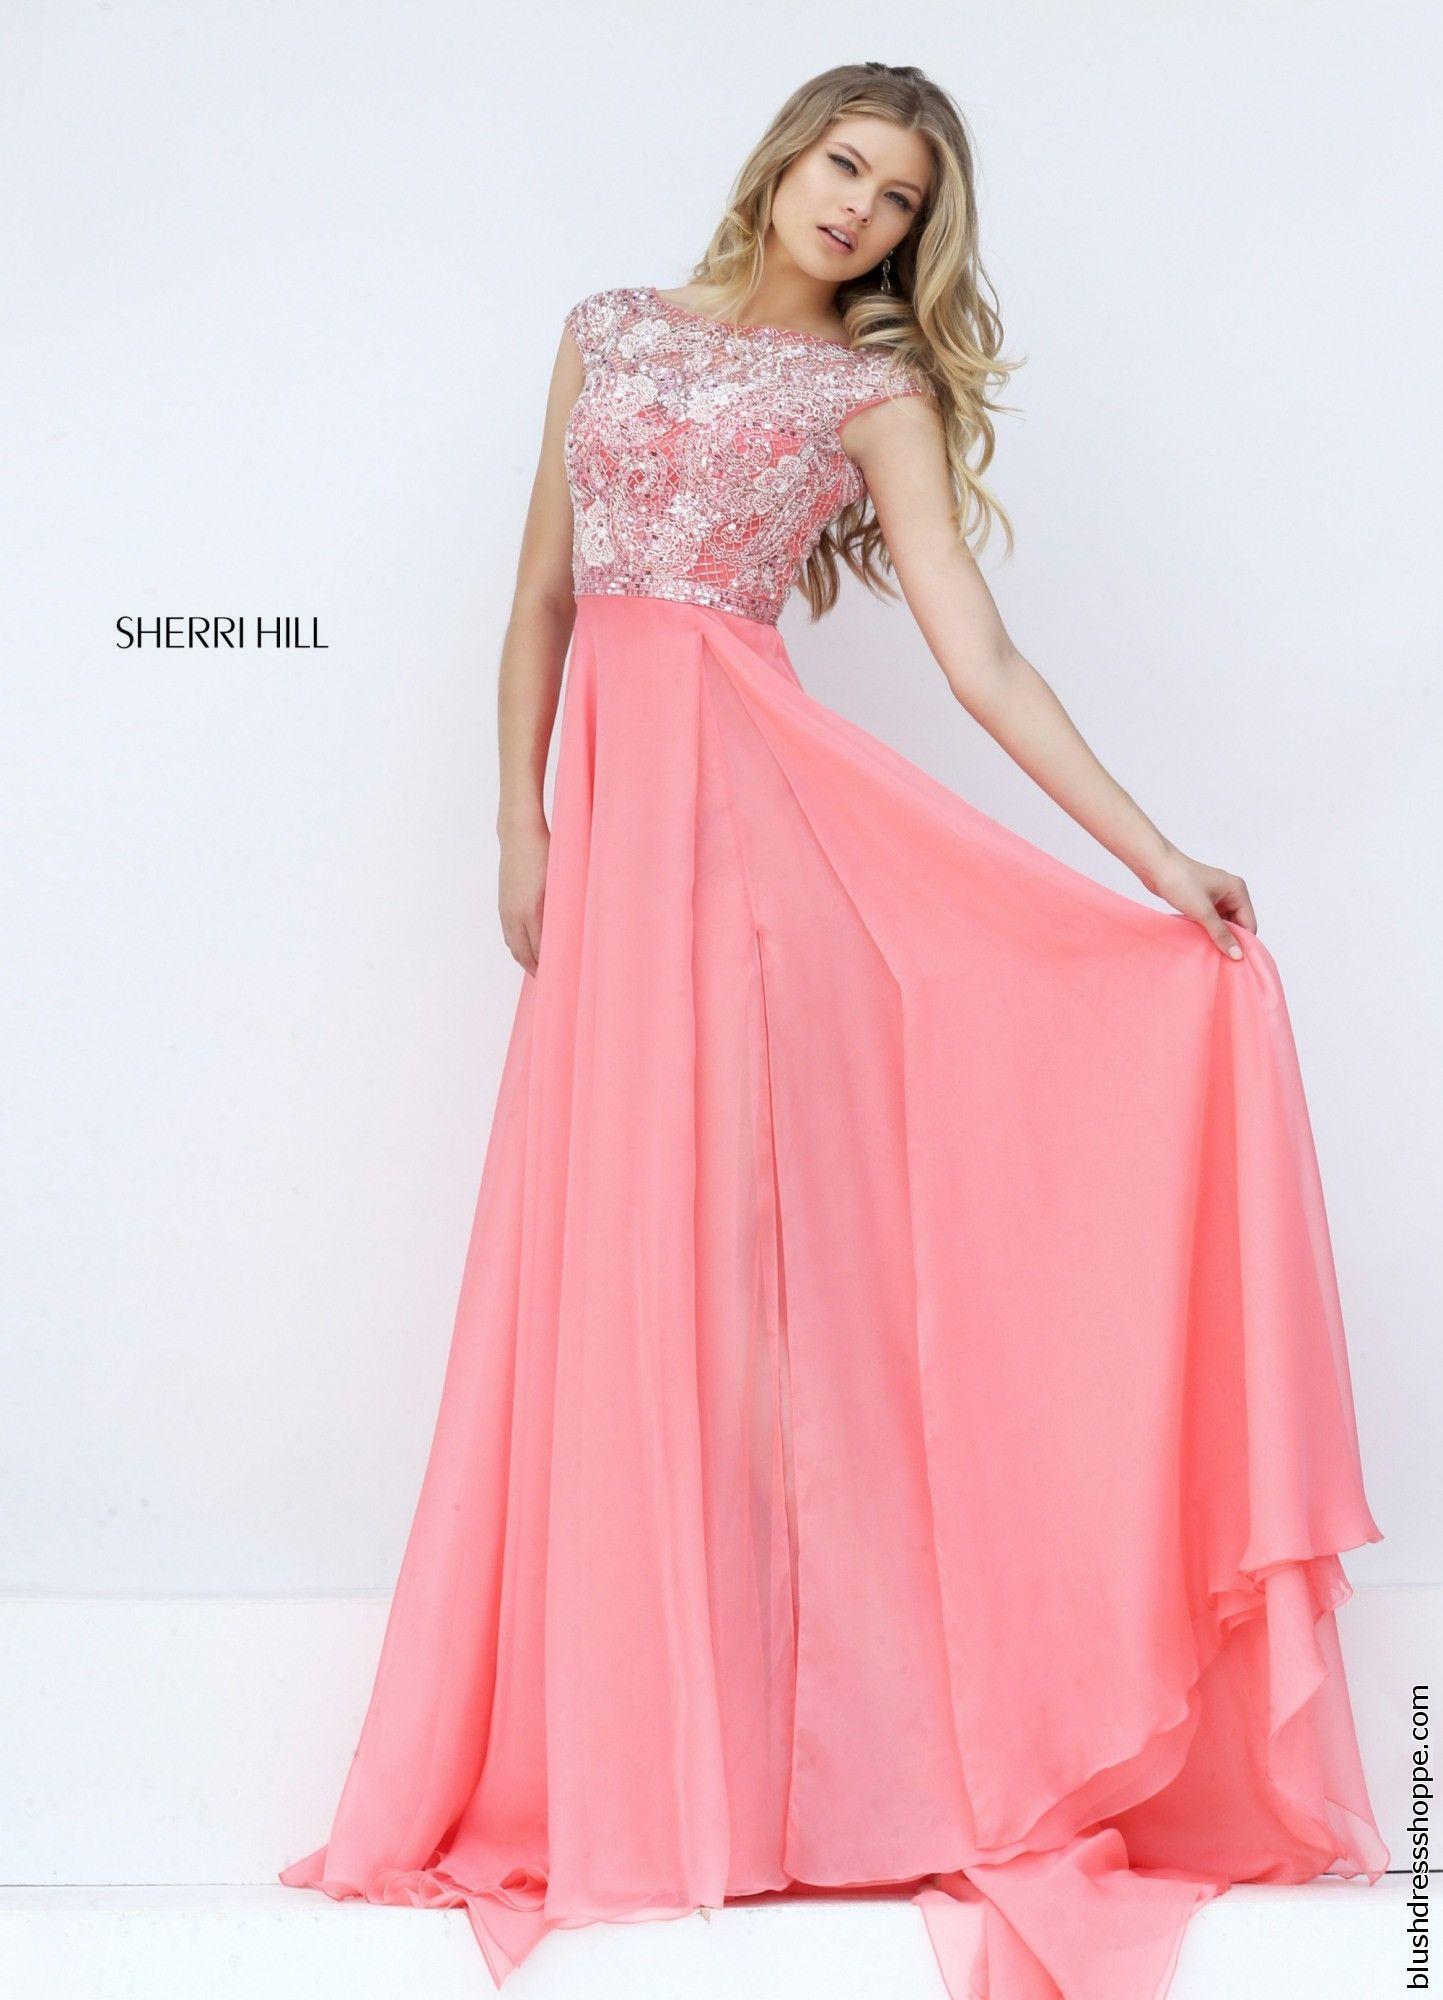 That Dress Store in Rincon near Savannah, GA | chic | Pinterest ...